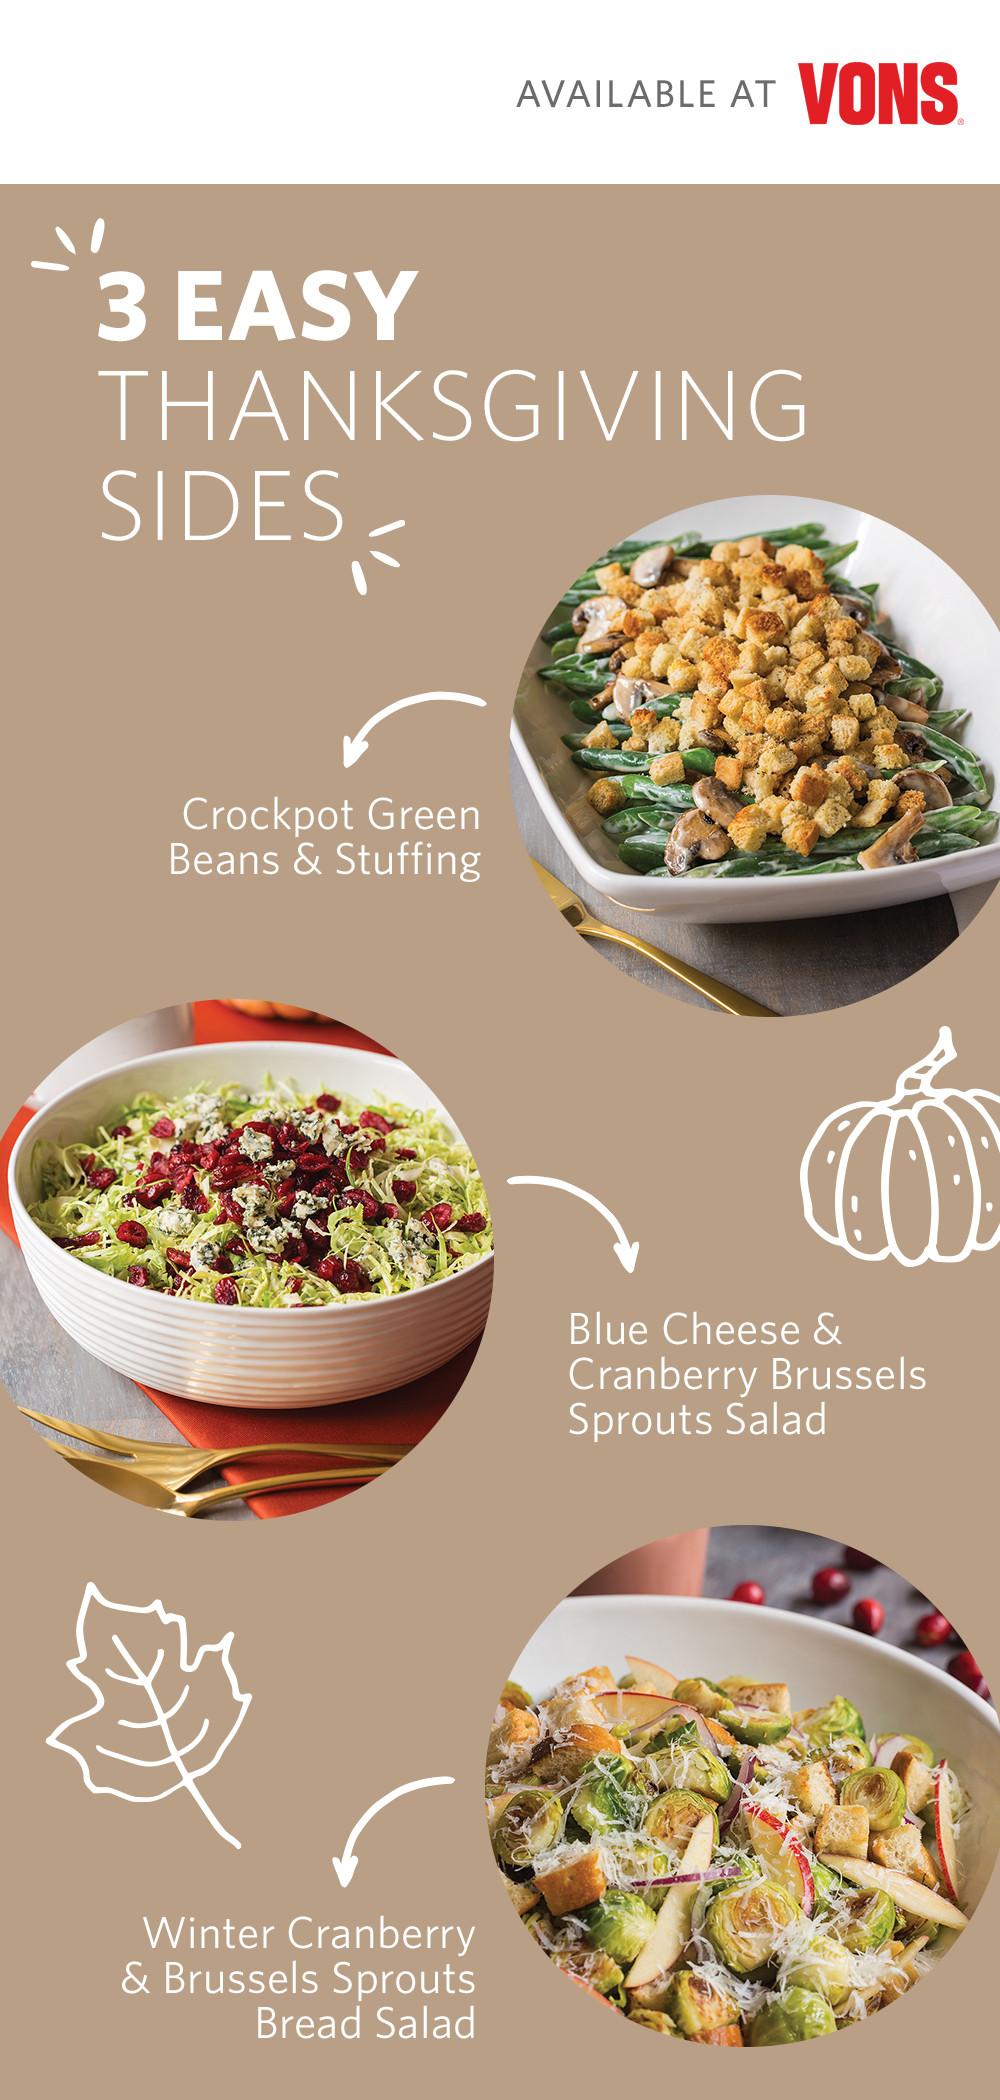 Albertsons Thanksgiving Dinners  Vons Thanksgiving Deals